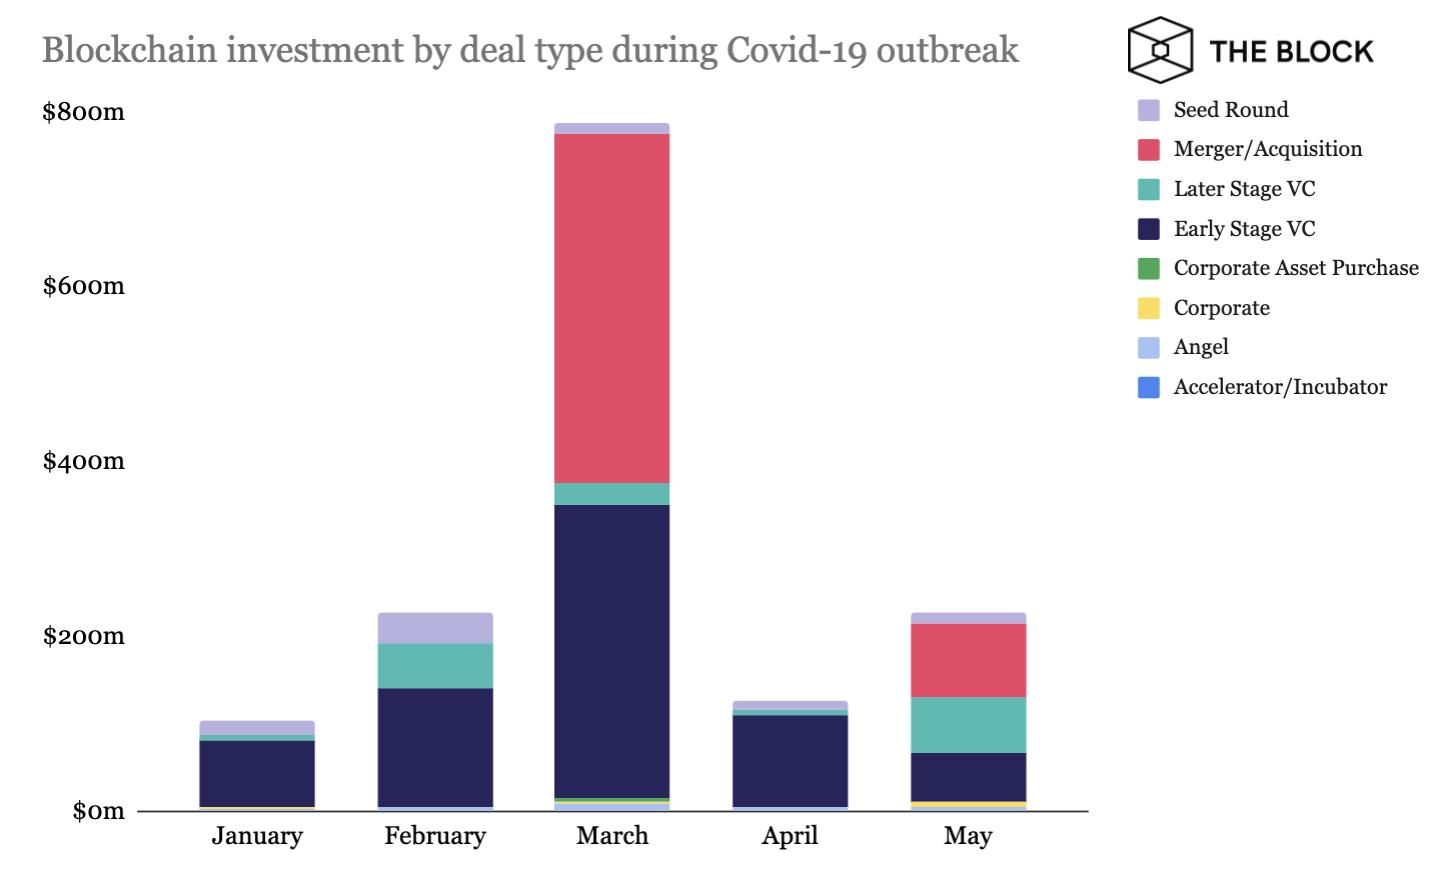 Как коронавирус повлиял на динамику инвестиций в биткоин-индустрию